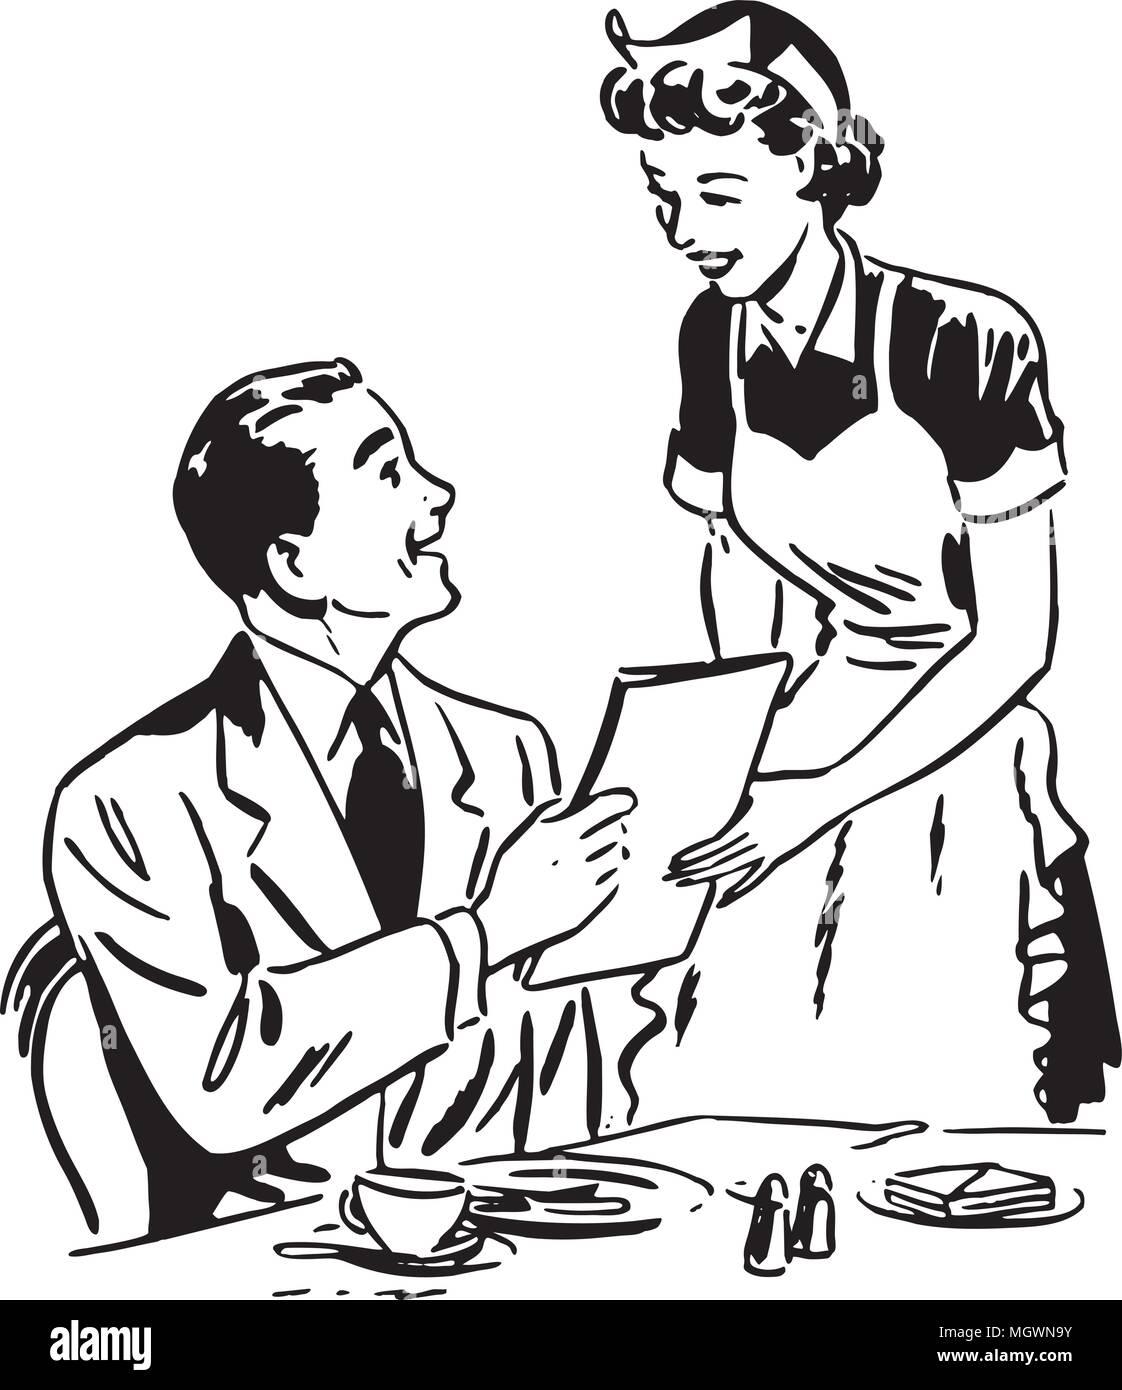 waitress handing out menu - retro clipart illustration stock vector